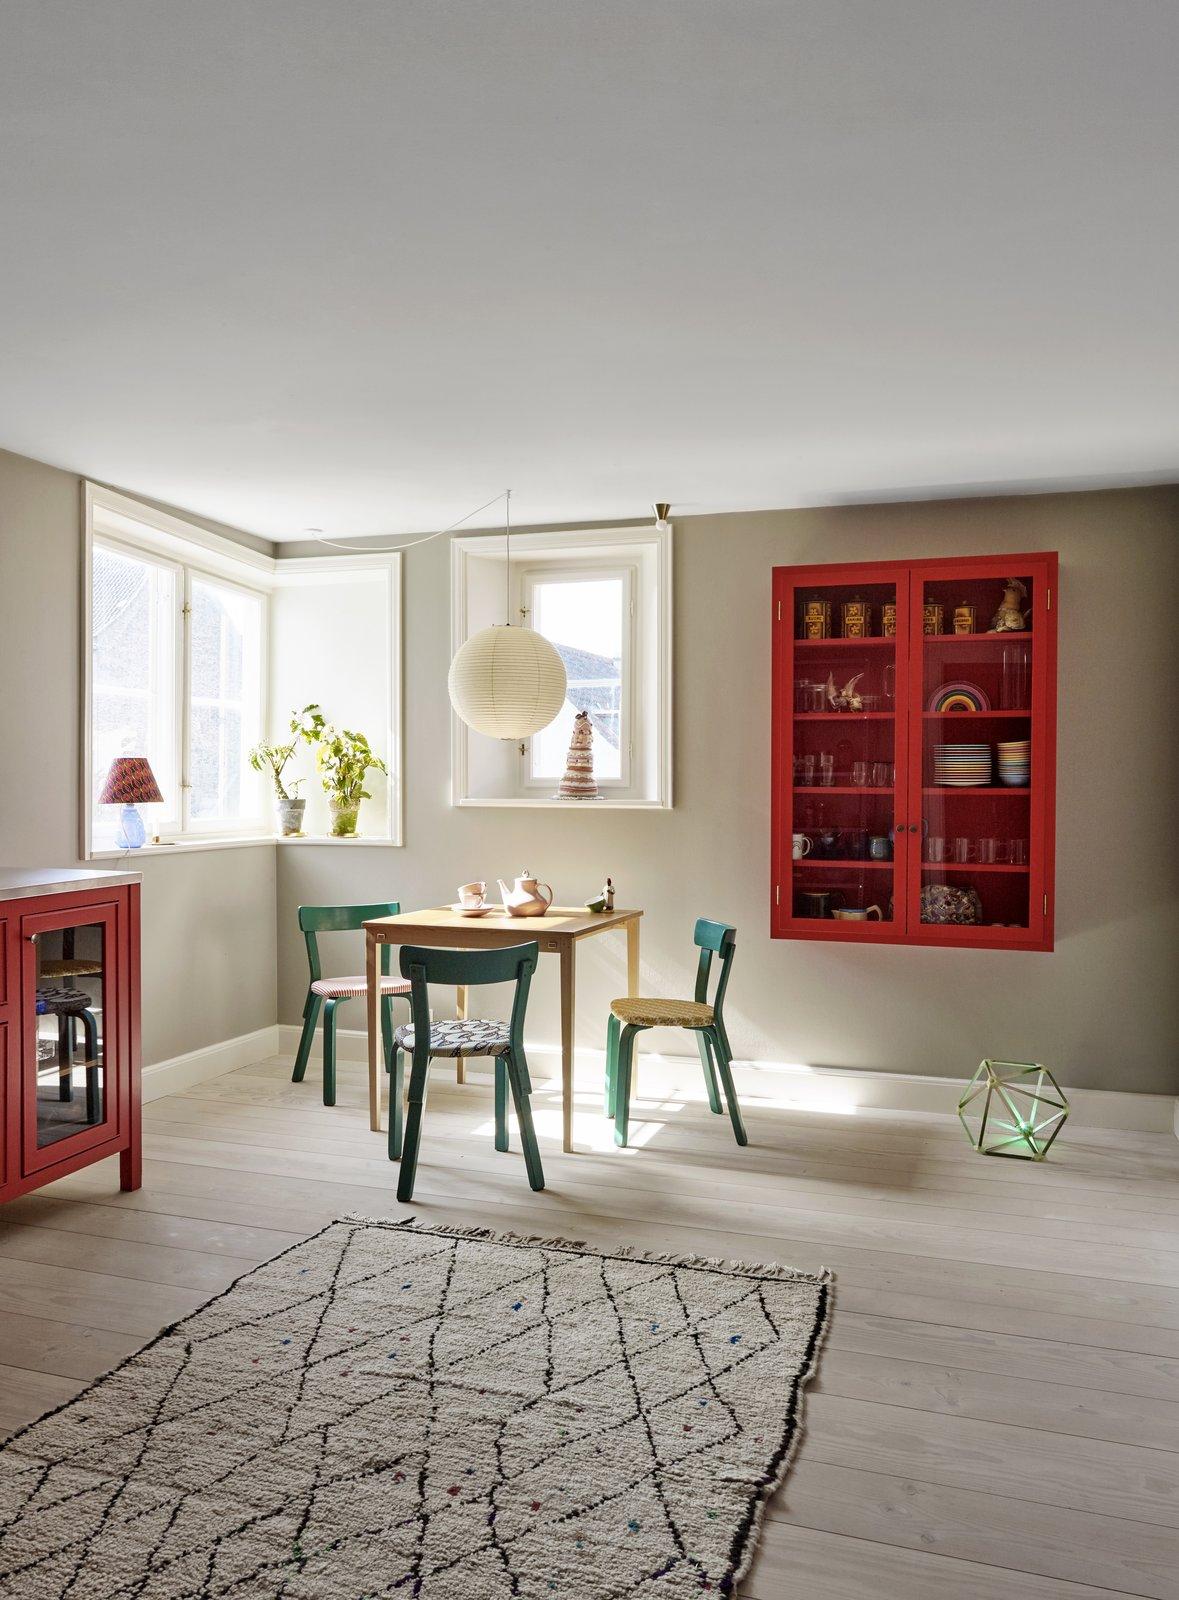 The Apartment by Tina Seidenfaden Busck kitchen table